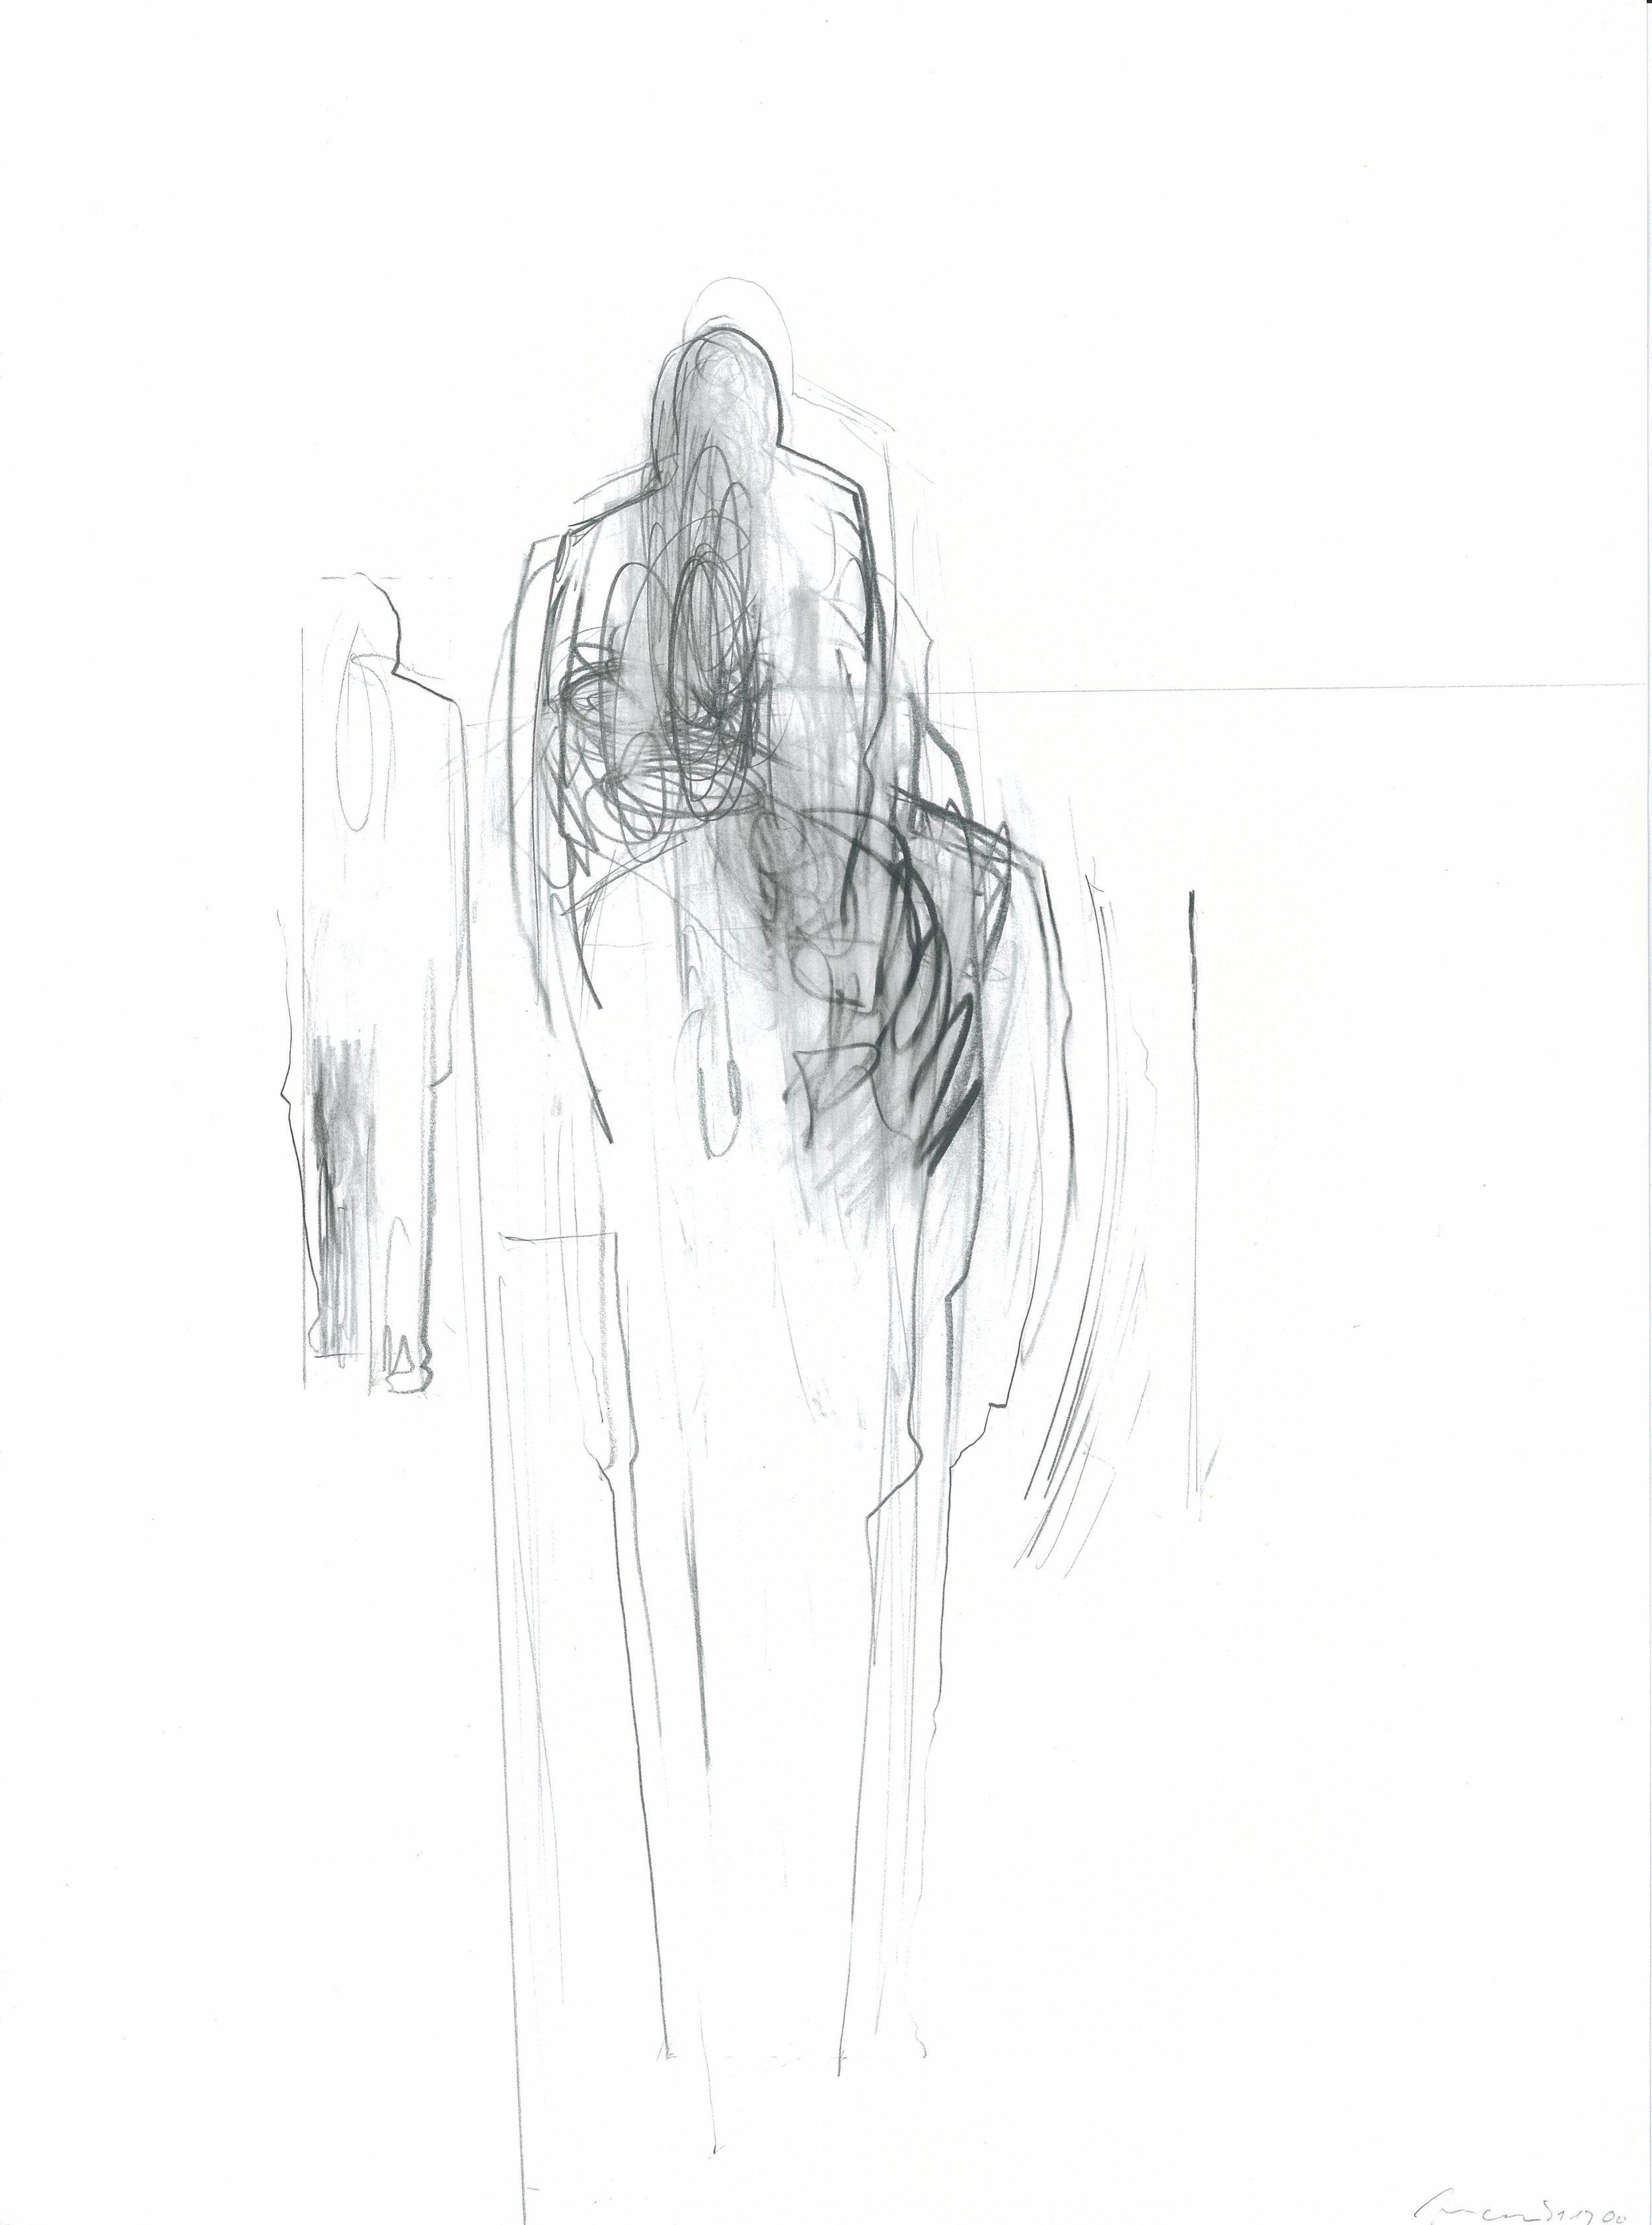 A.Zingerle - 2001, Pencil on paper, 40x30 (1).jpg